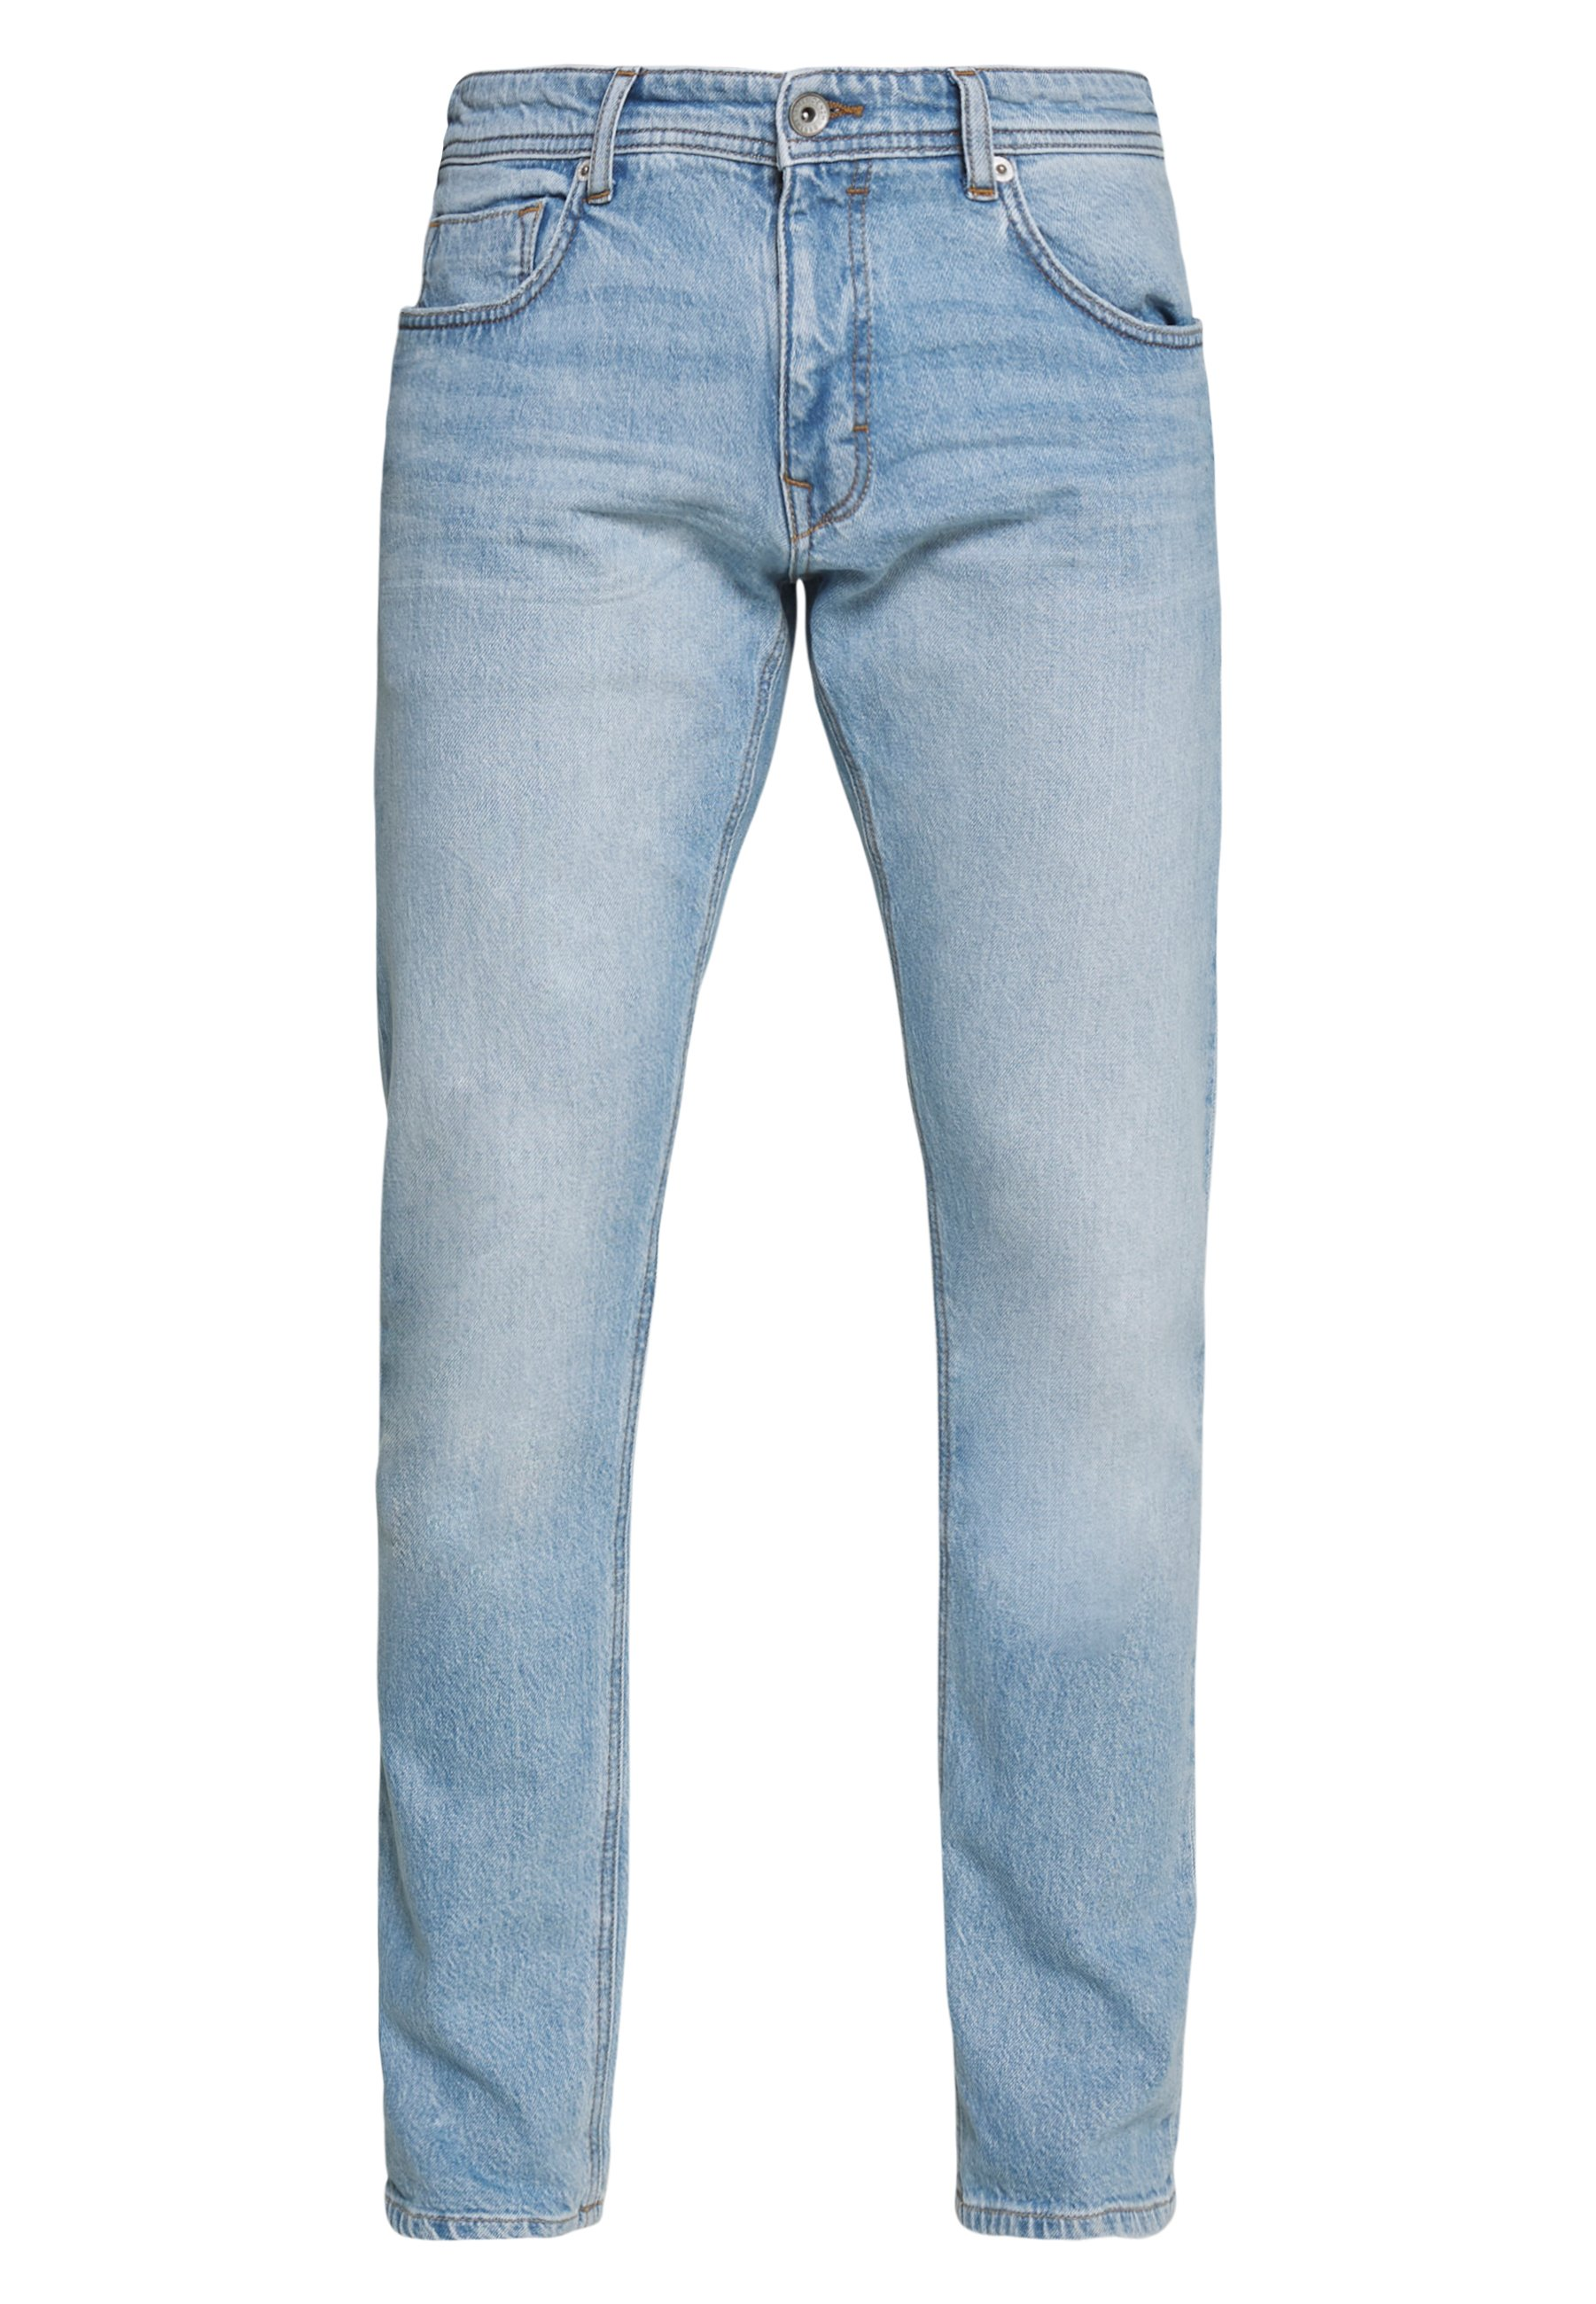 Esprit Jeansy Slim Fit - blue light wash